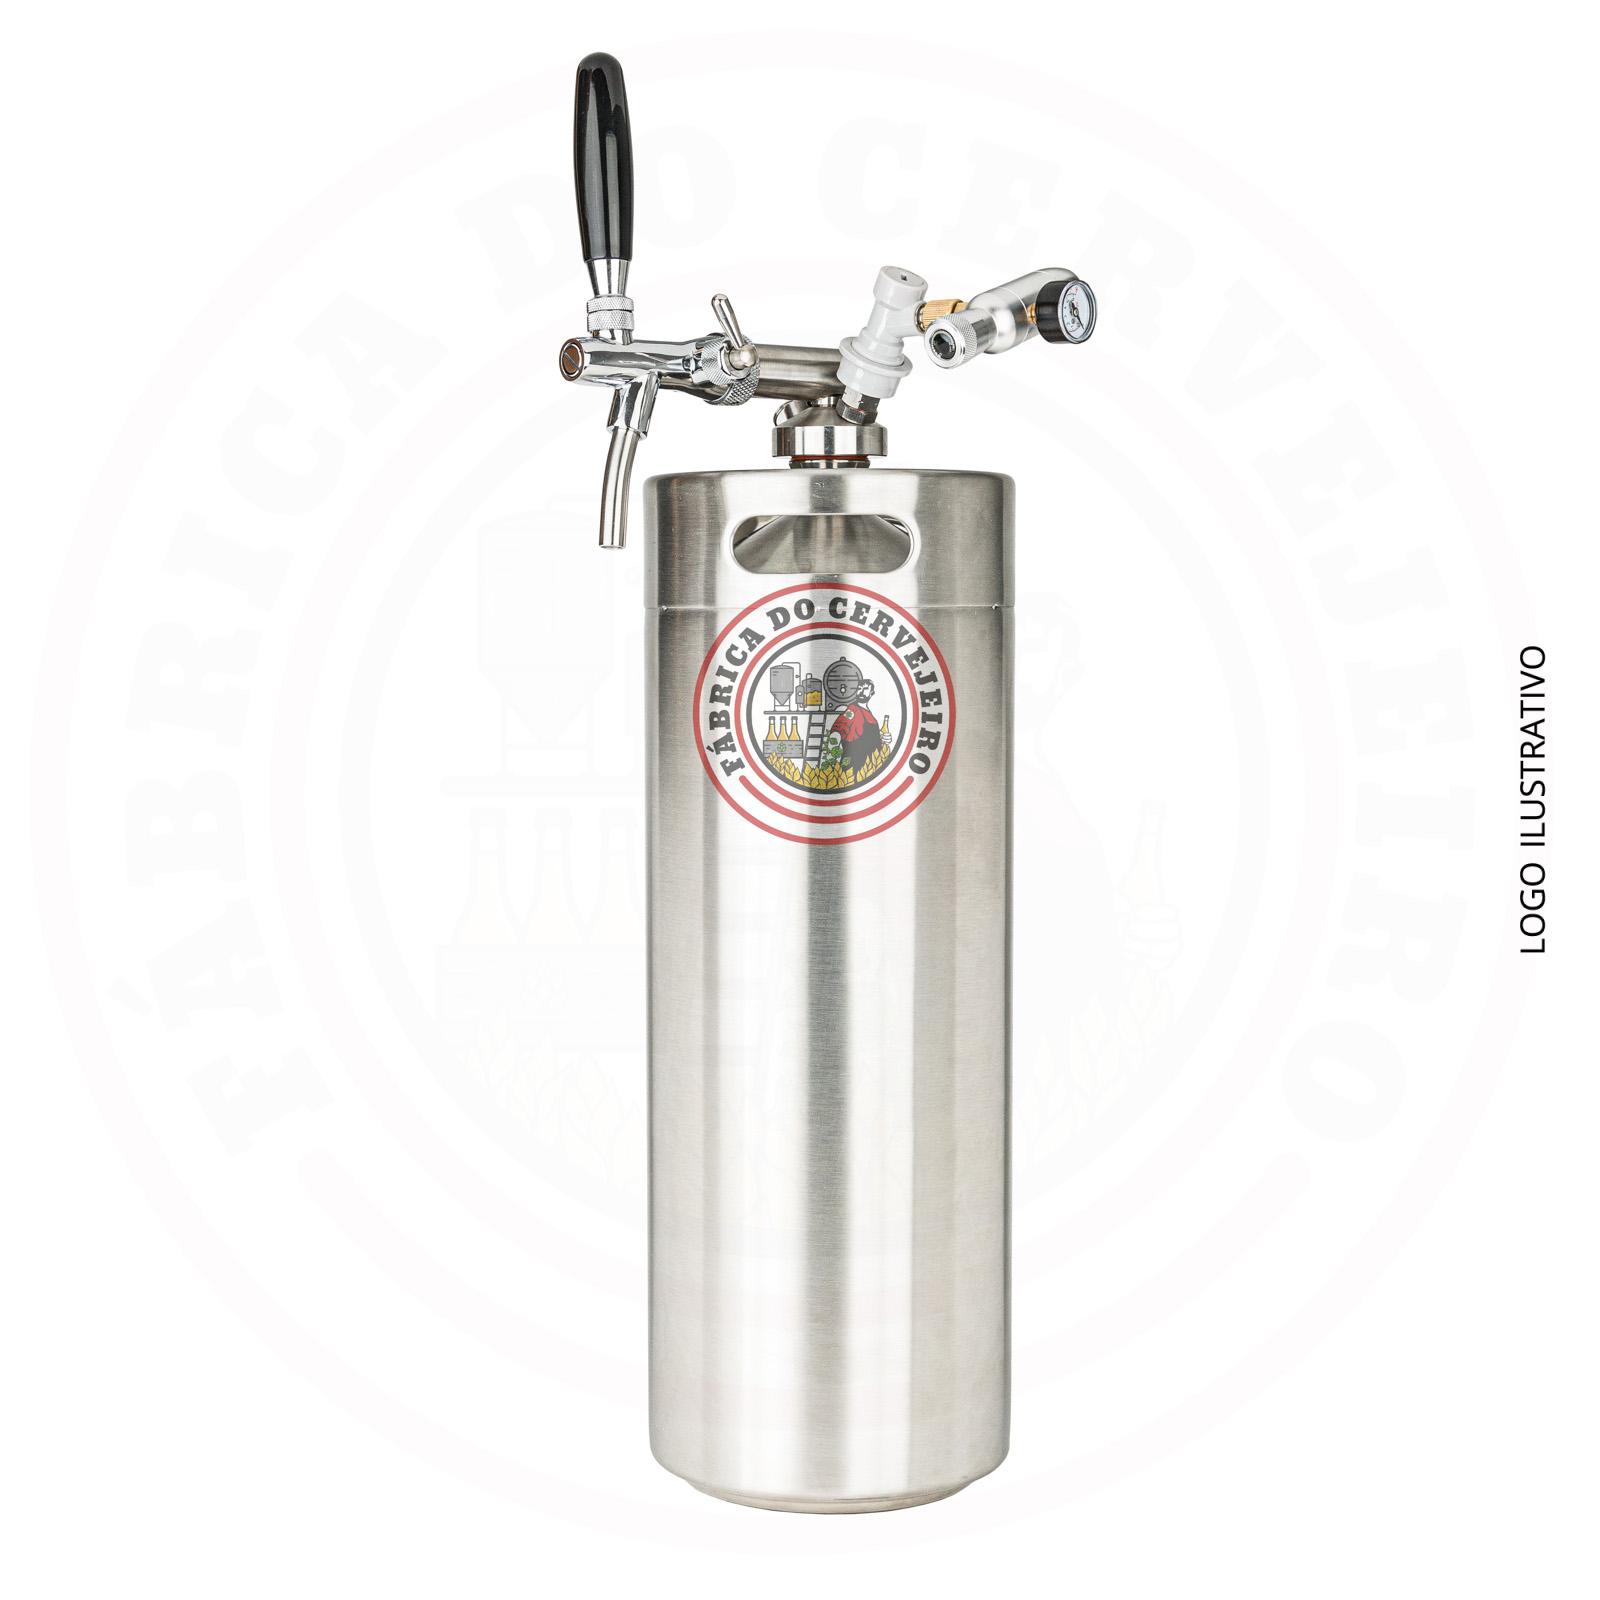 Kit mini keg growler 10L com torneira italiana e mini regulador hobby